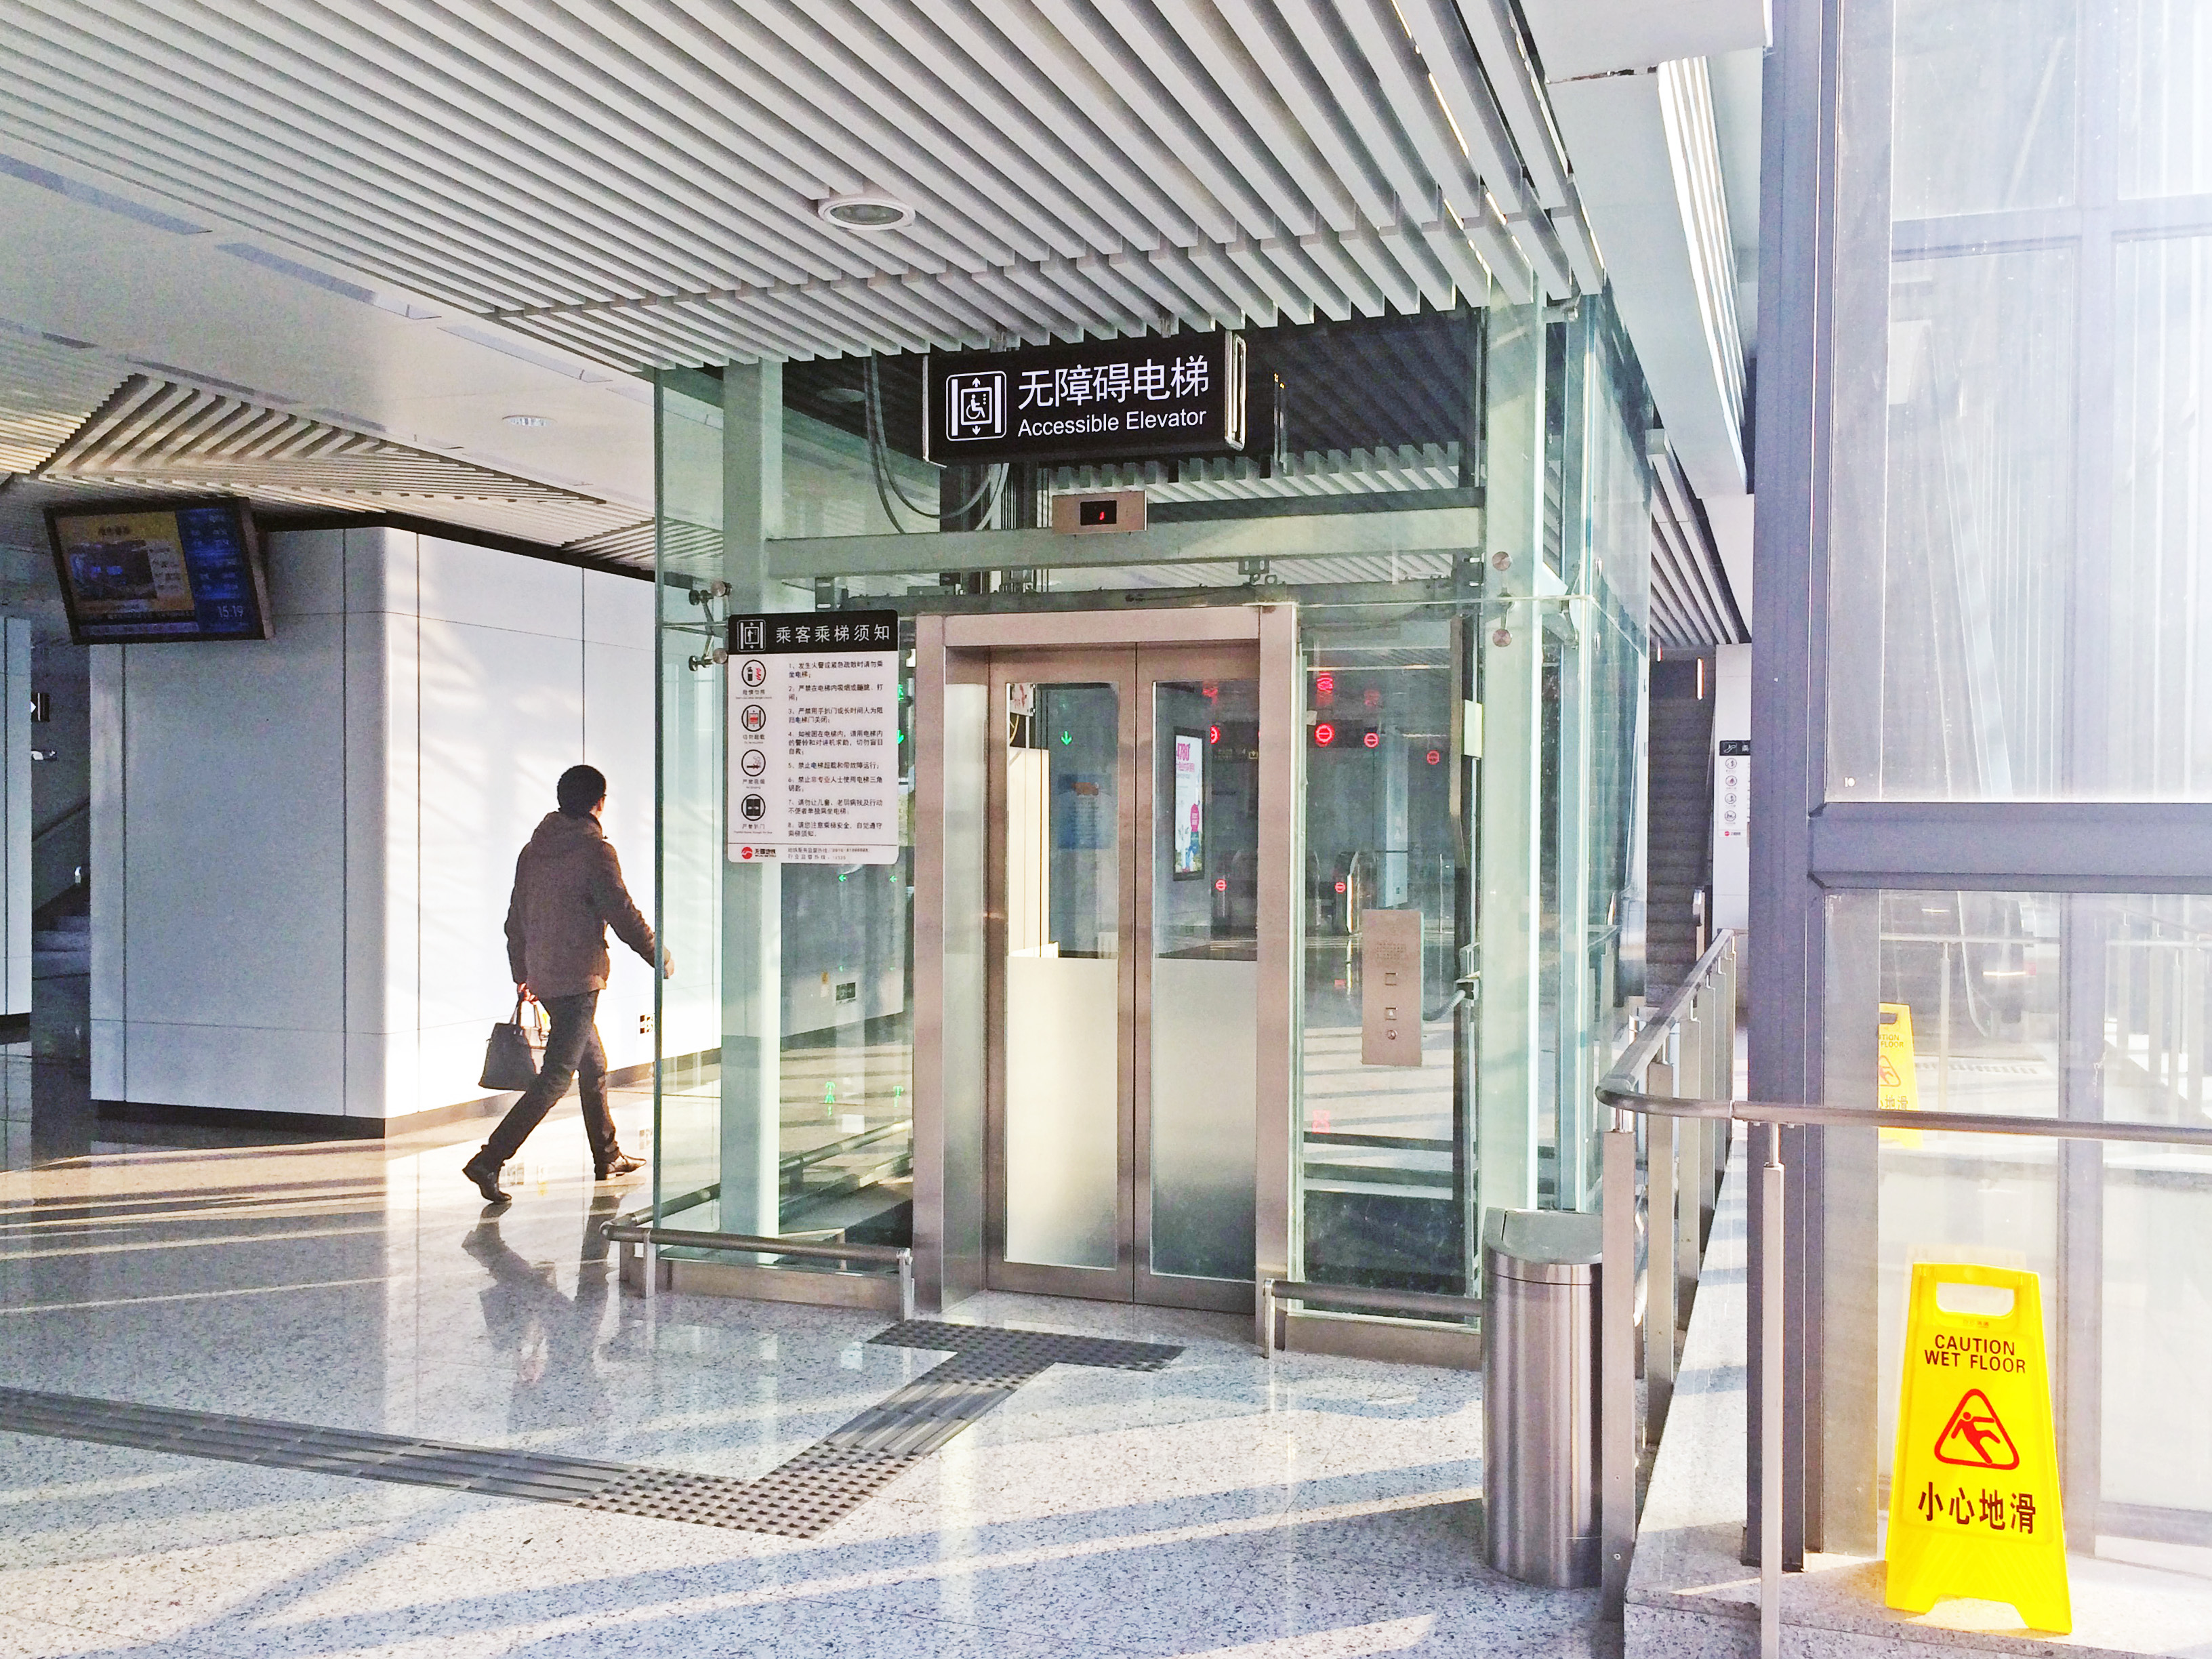 file:accessible elevator, wuxi metro.jpg - 维基